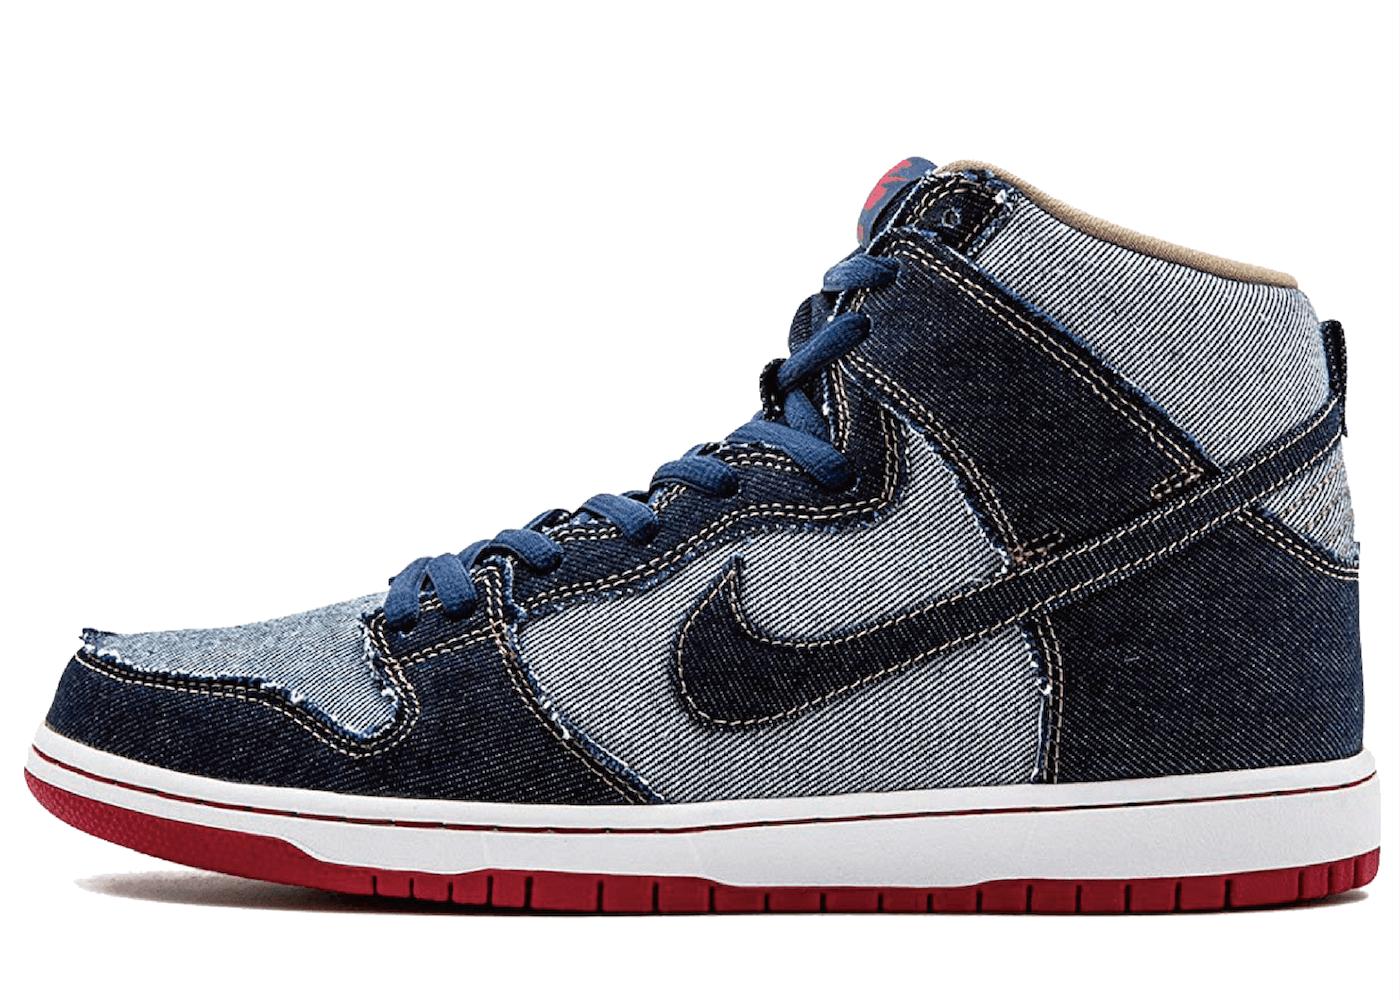 Nike SB Dunk High Reese Forbes Denim